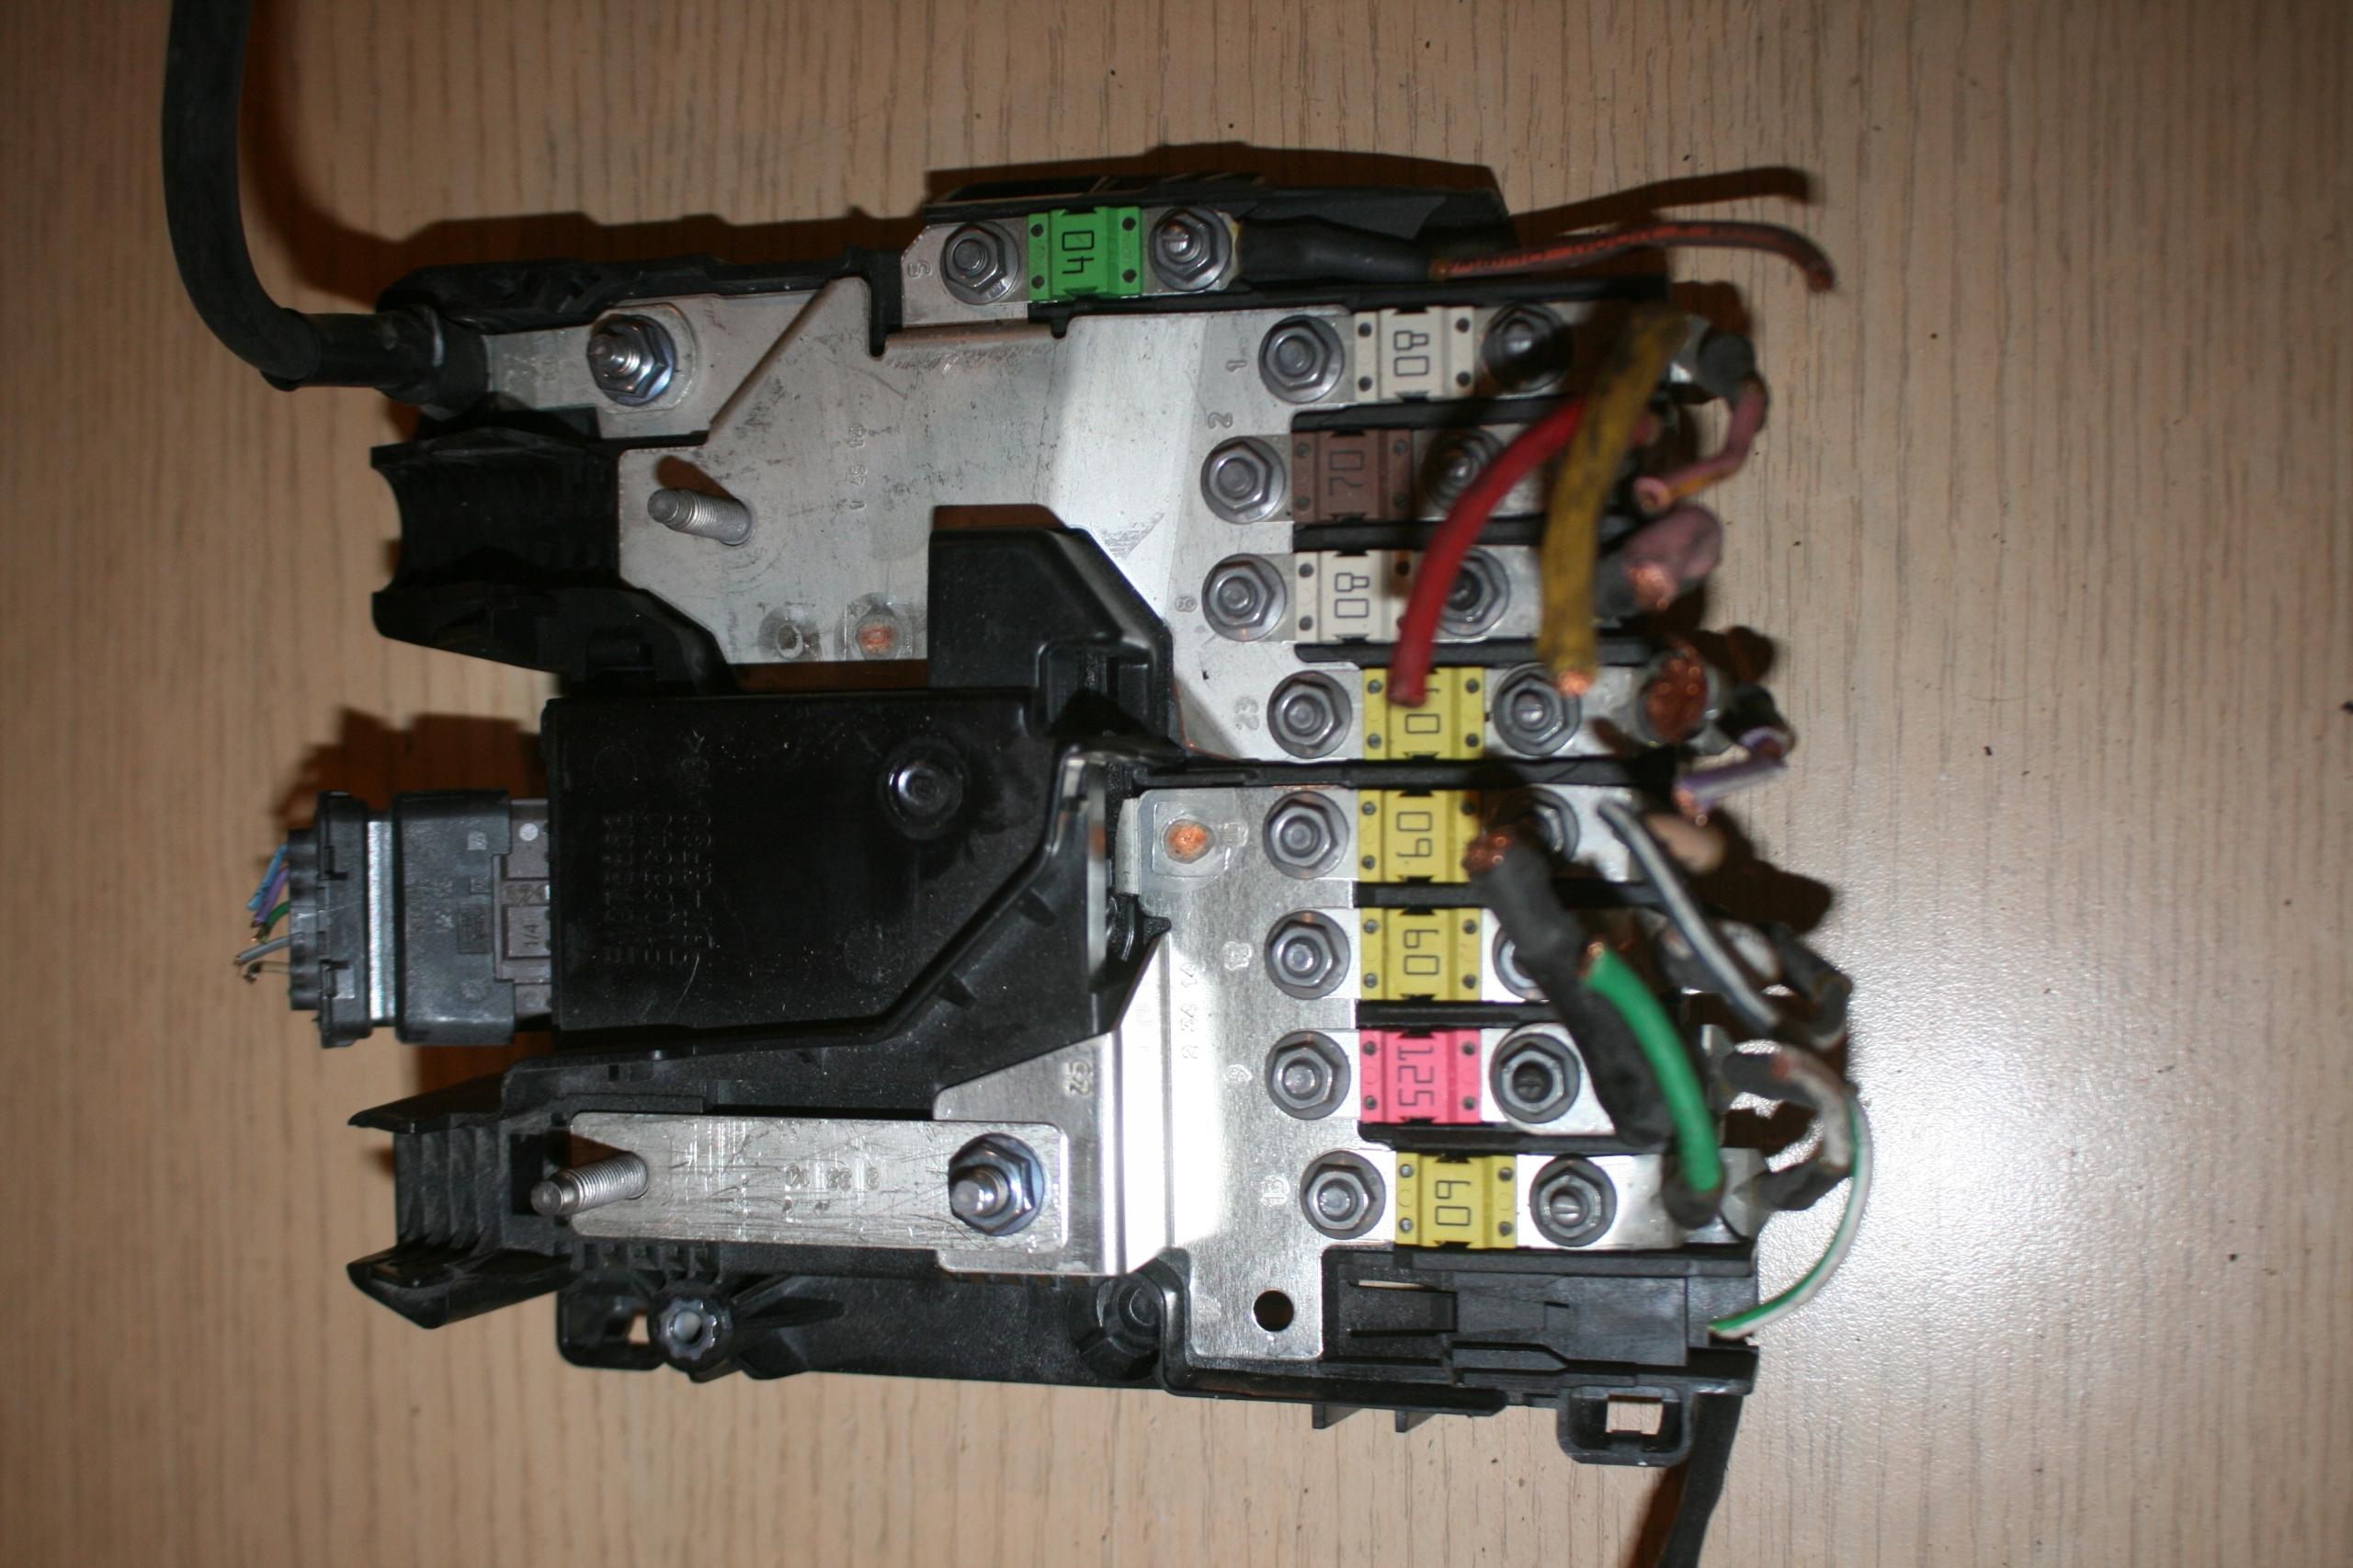 модуль драйвер батареи c4 пикассо 9675350380